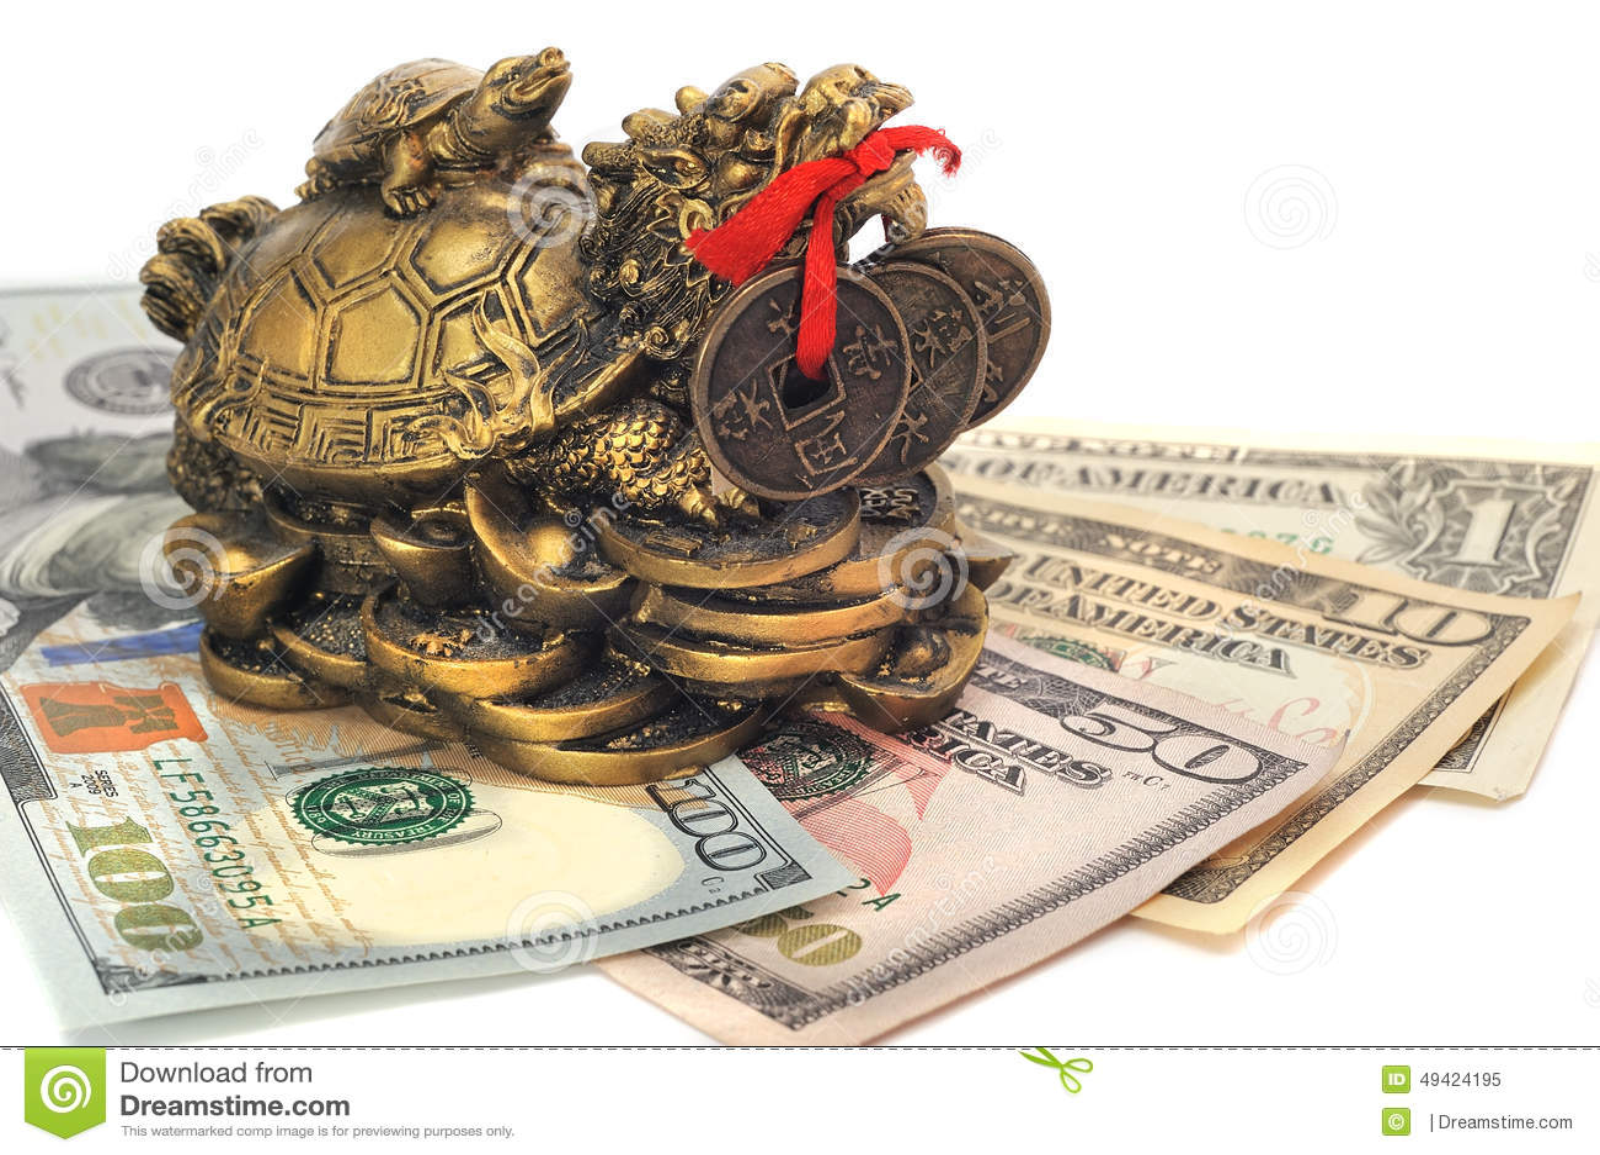 Chinese Dragon Turtle Symbol Of Money On The Bills Stock Image